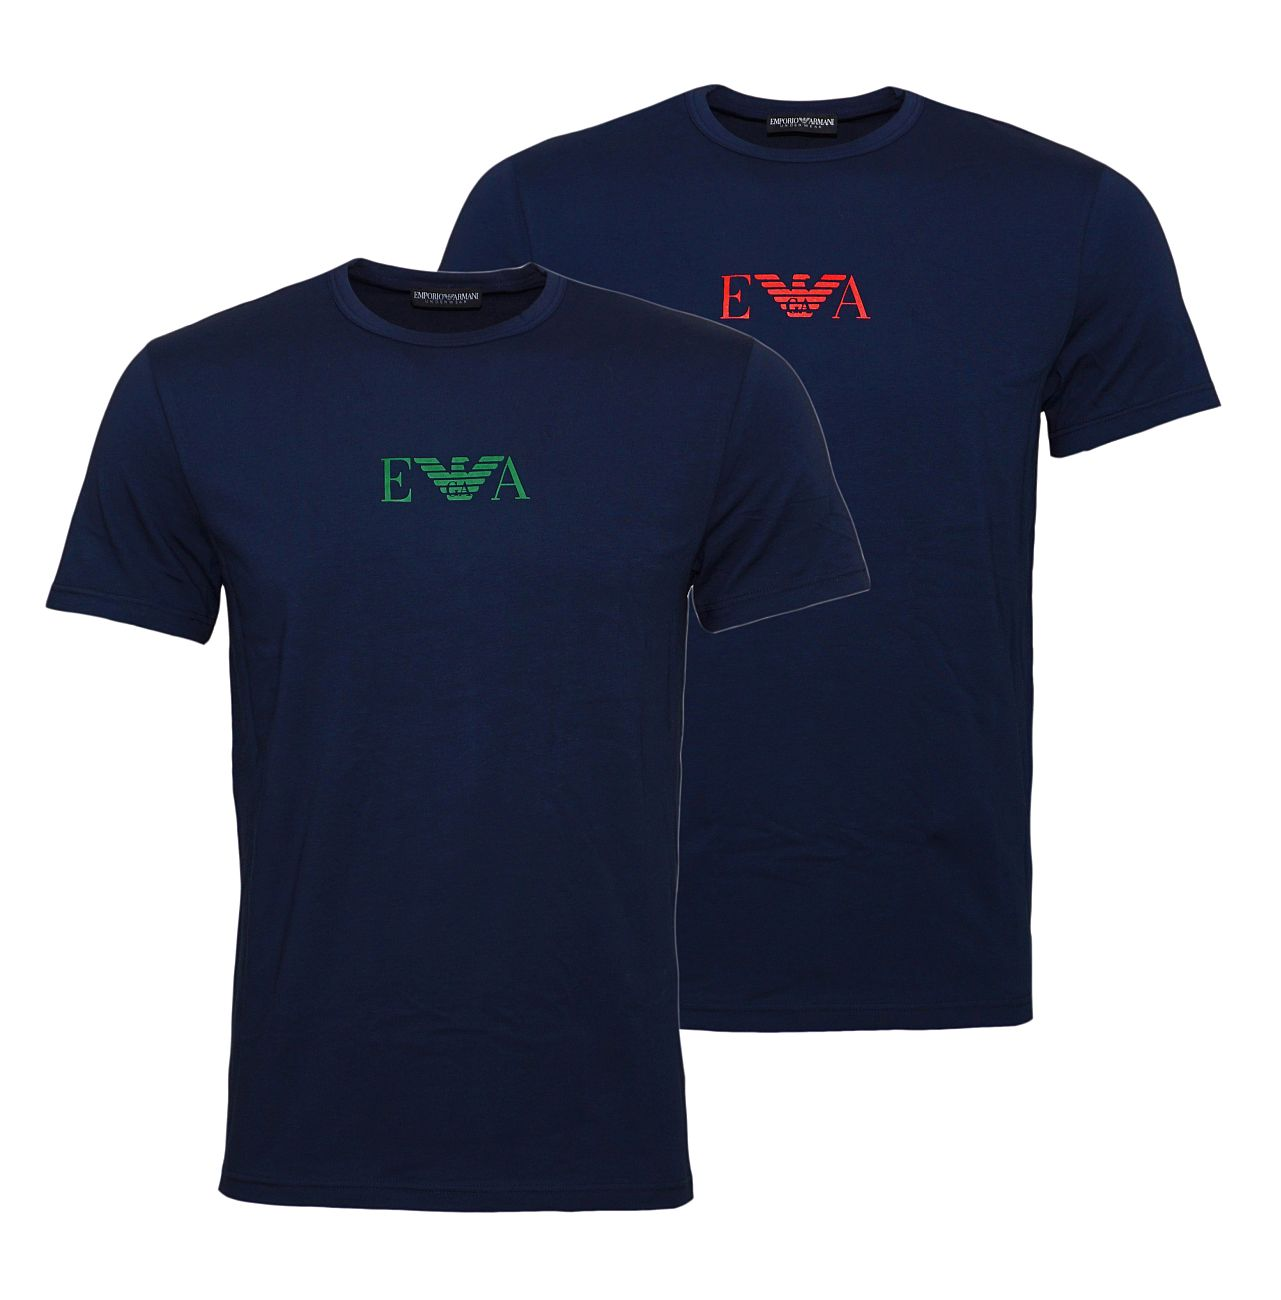 Emporio Armani 2er Pack T-Shirts Rundhals 111267 8A715 27435 MARINE/MARINE SH18-EAT1